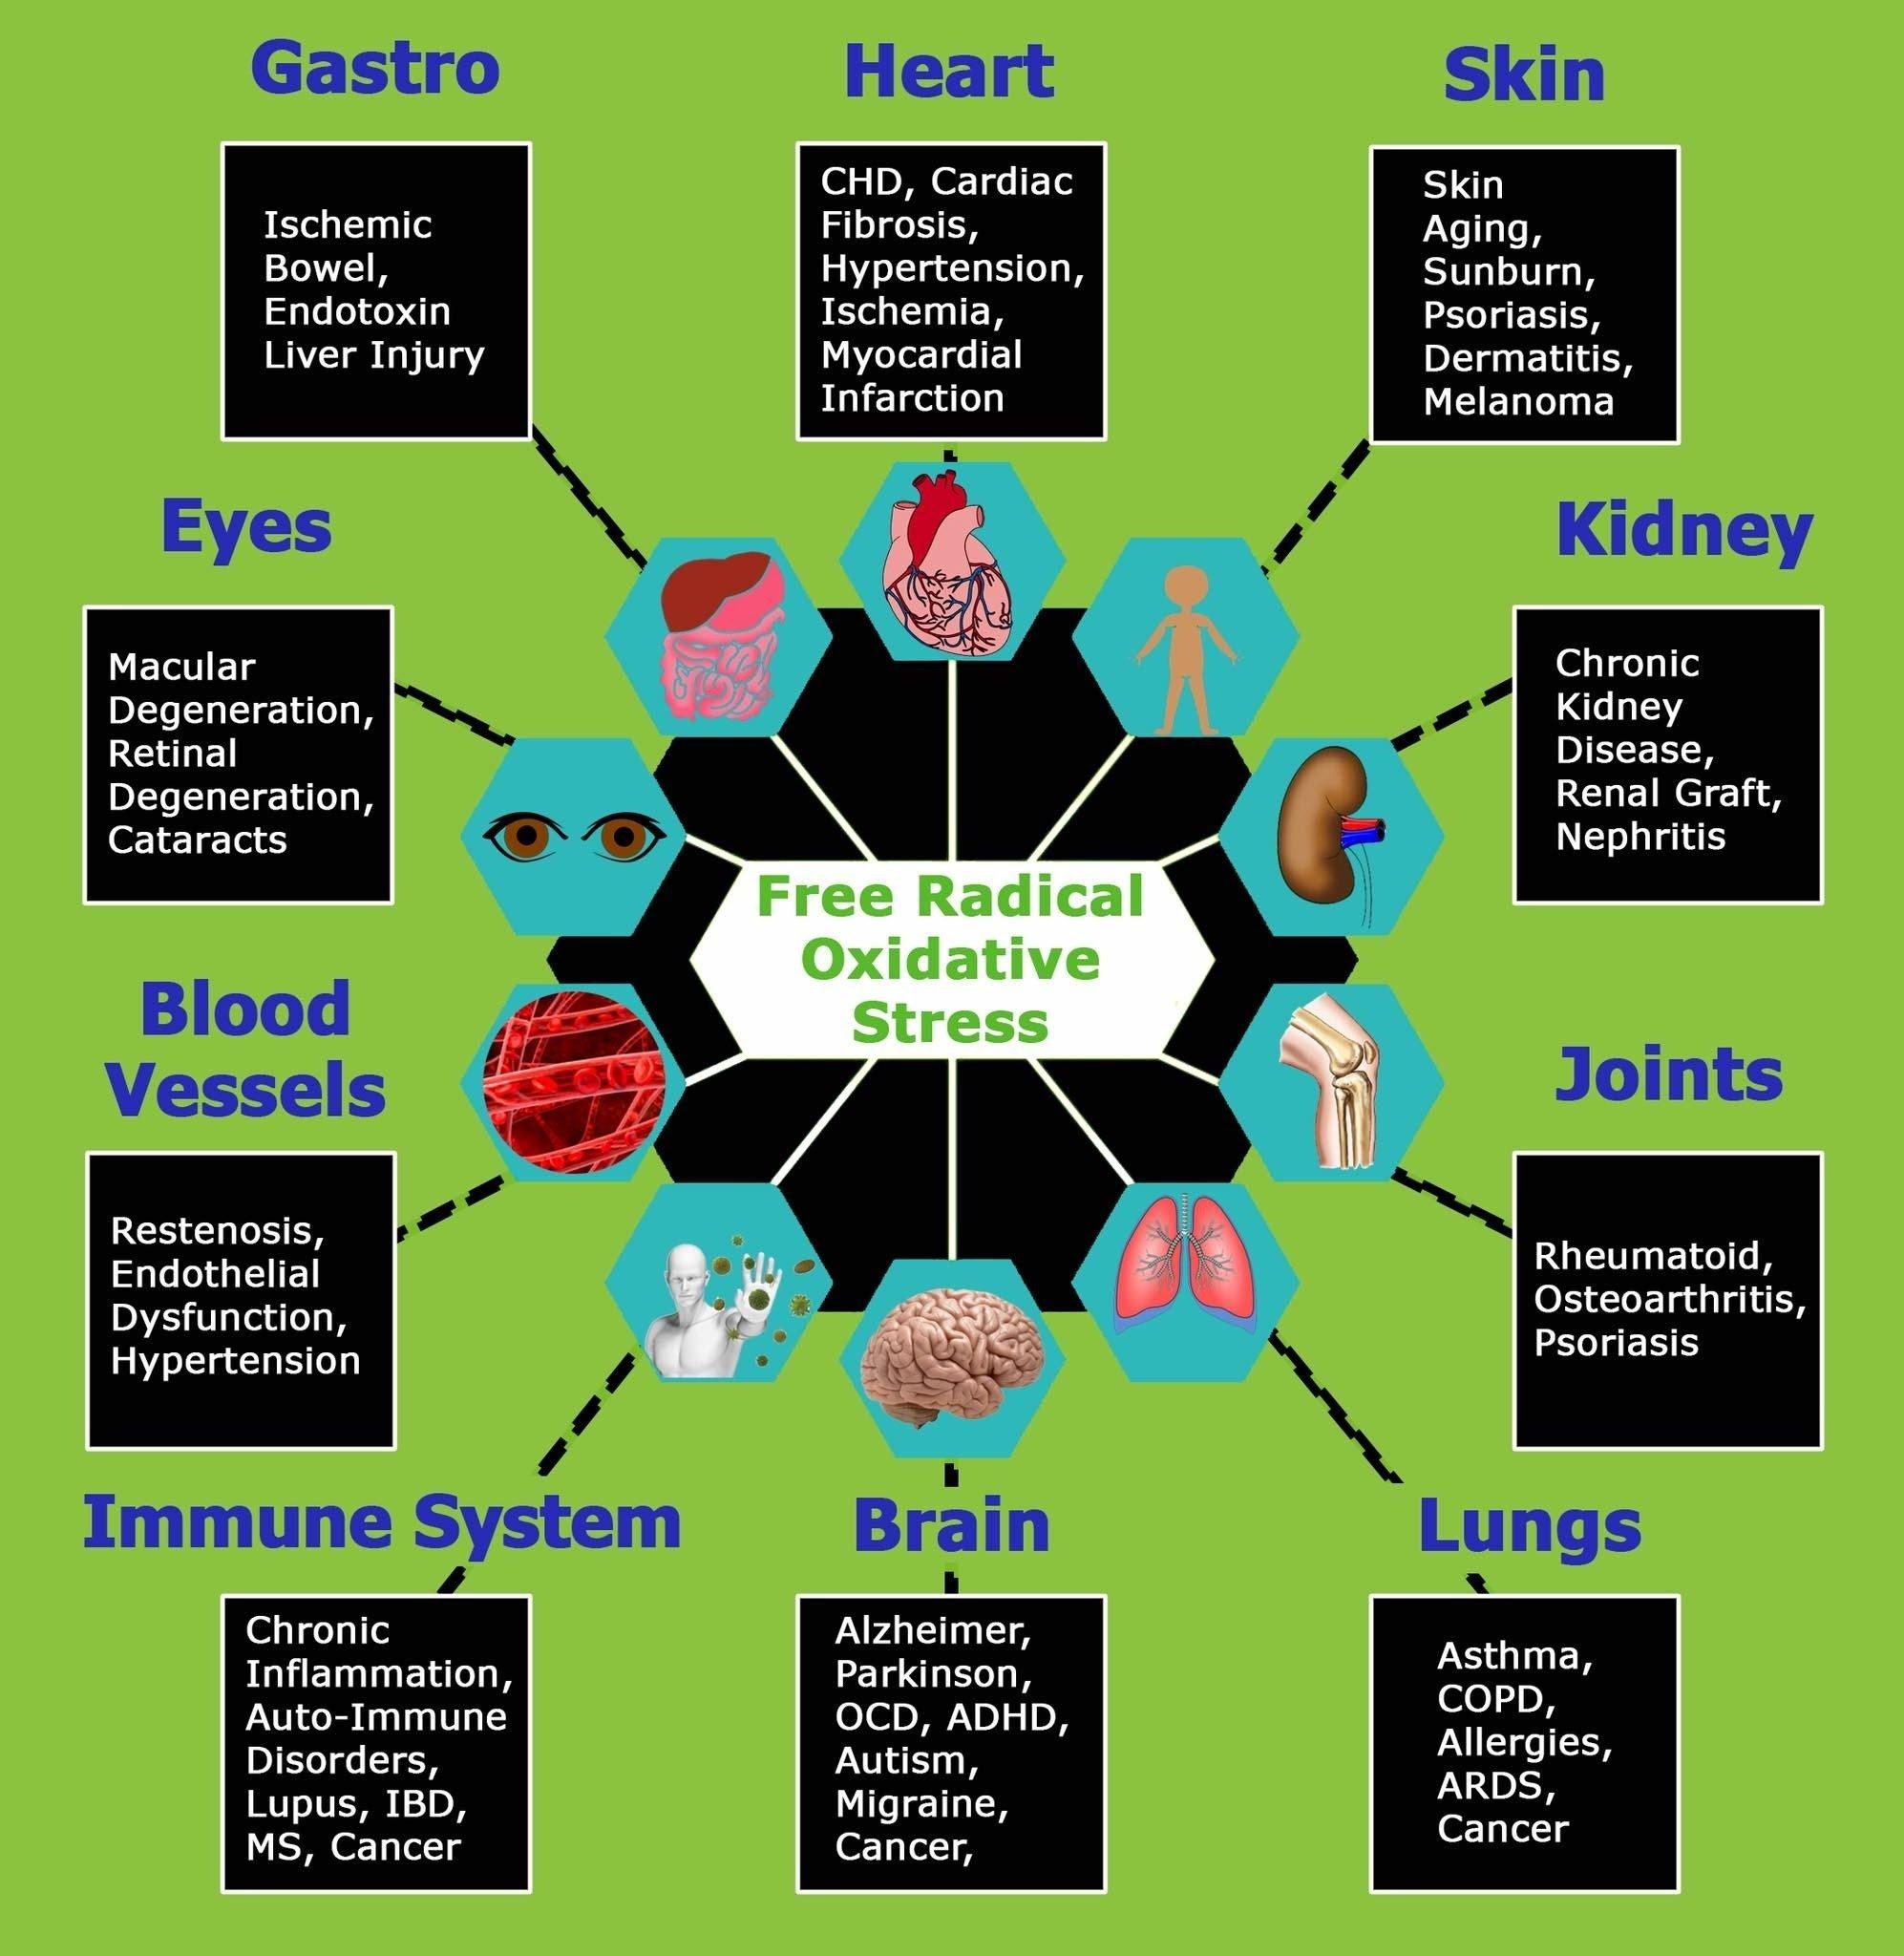 free radical oxidative stress